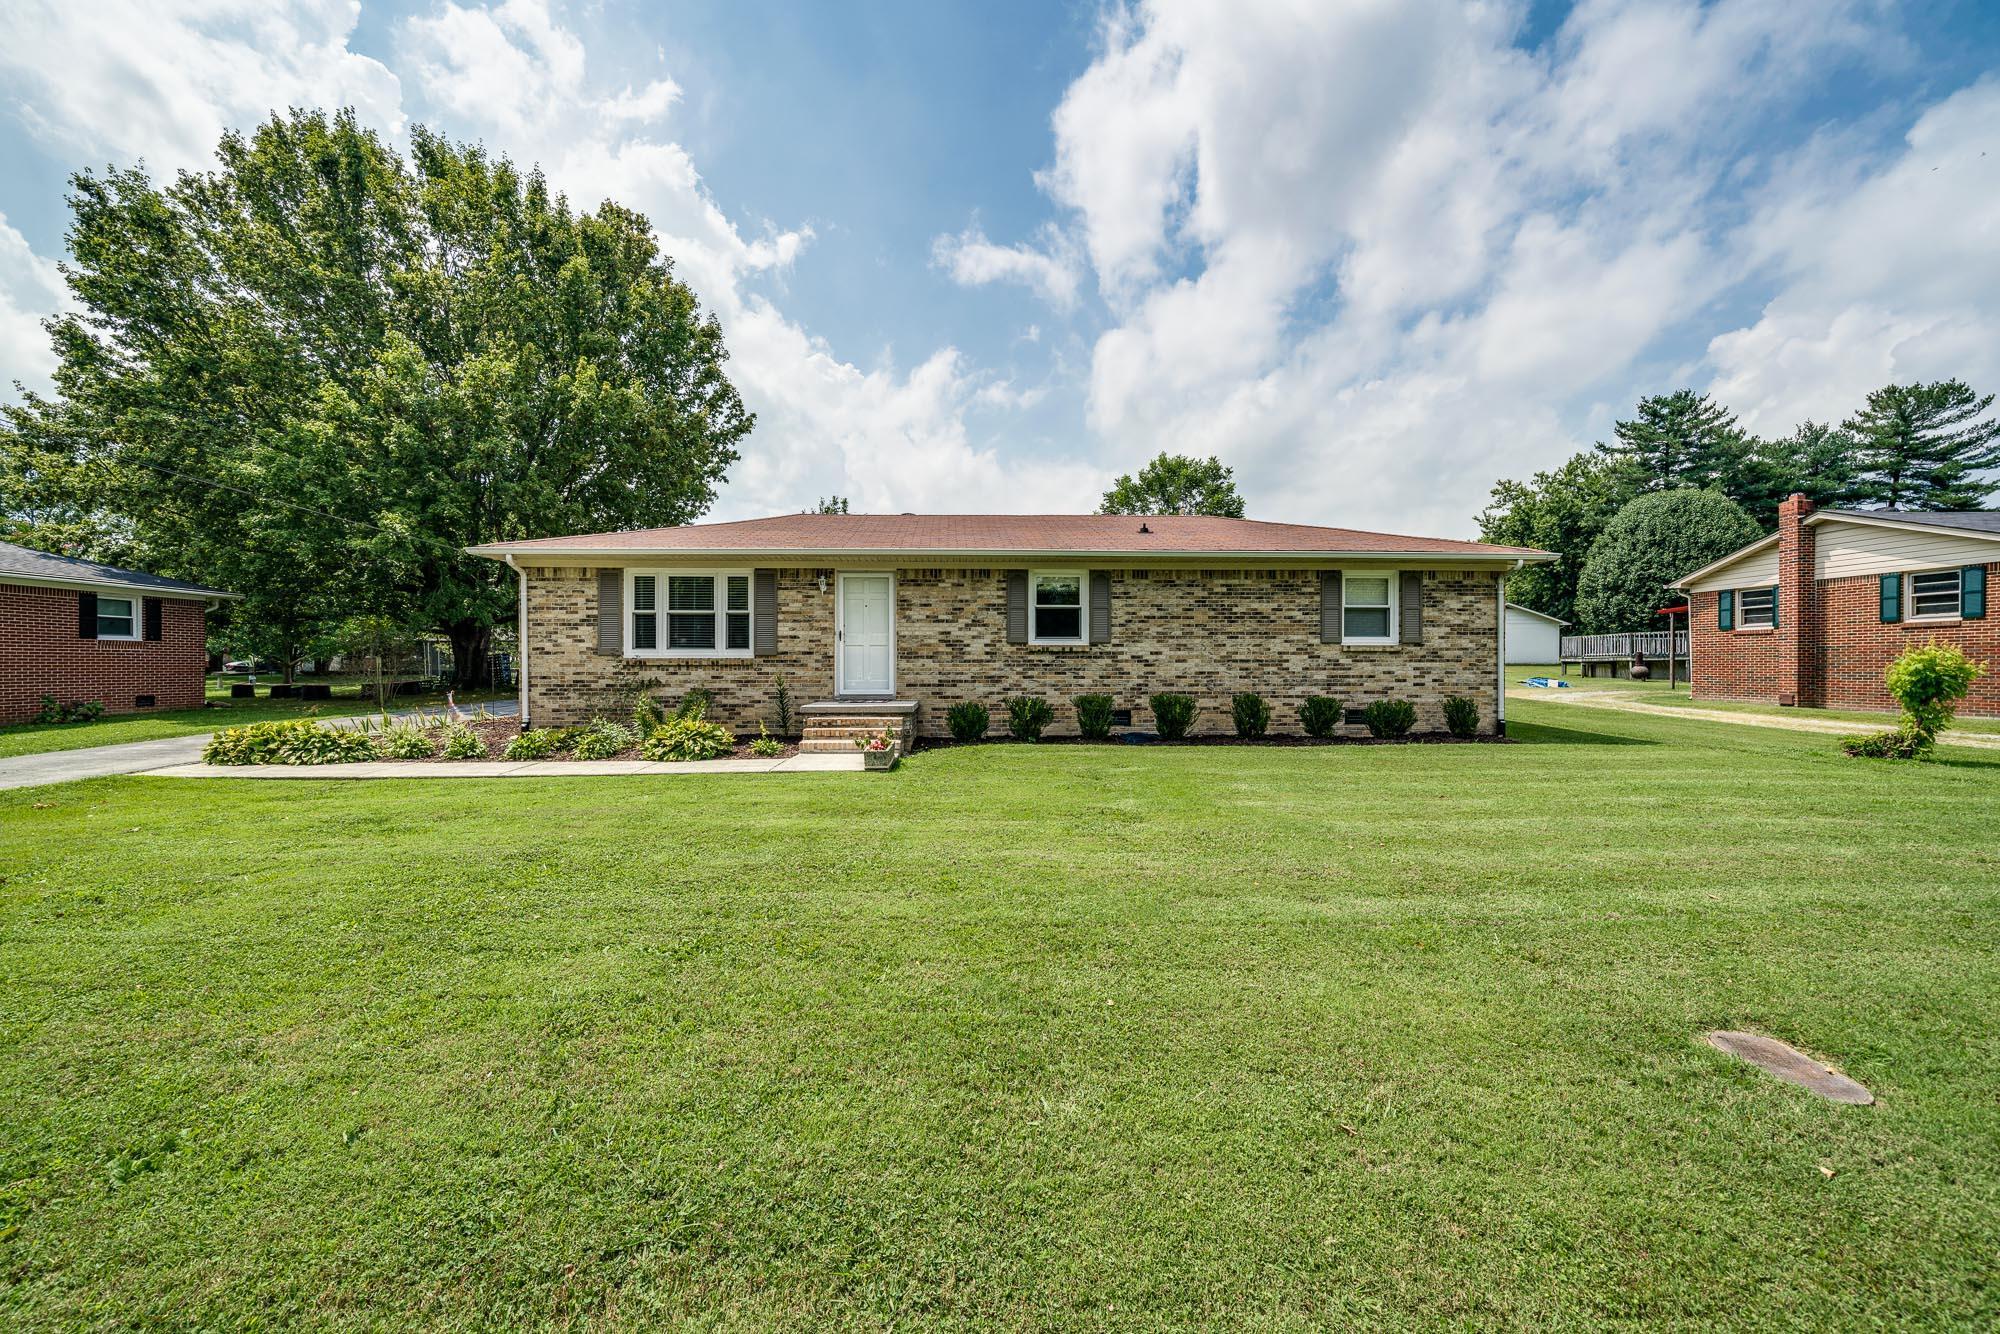 843 Anthony Ave, Smithville, TN 37166 - Smithville, TN real estate listing